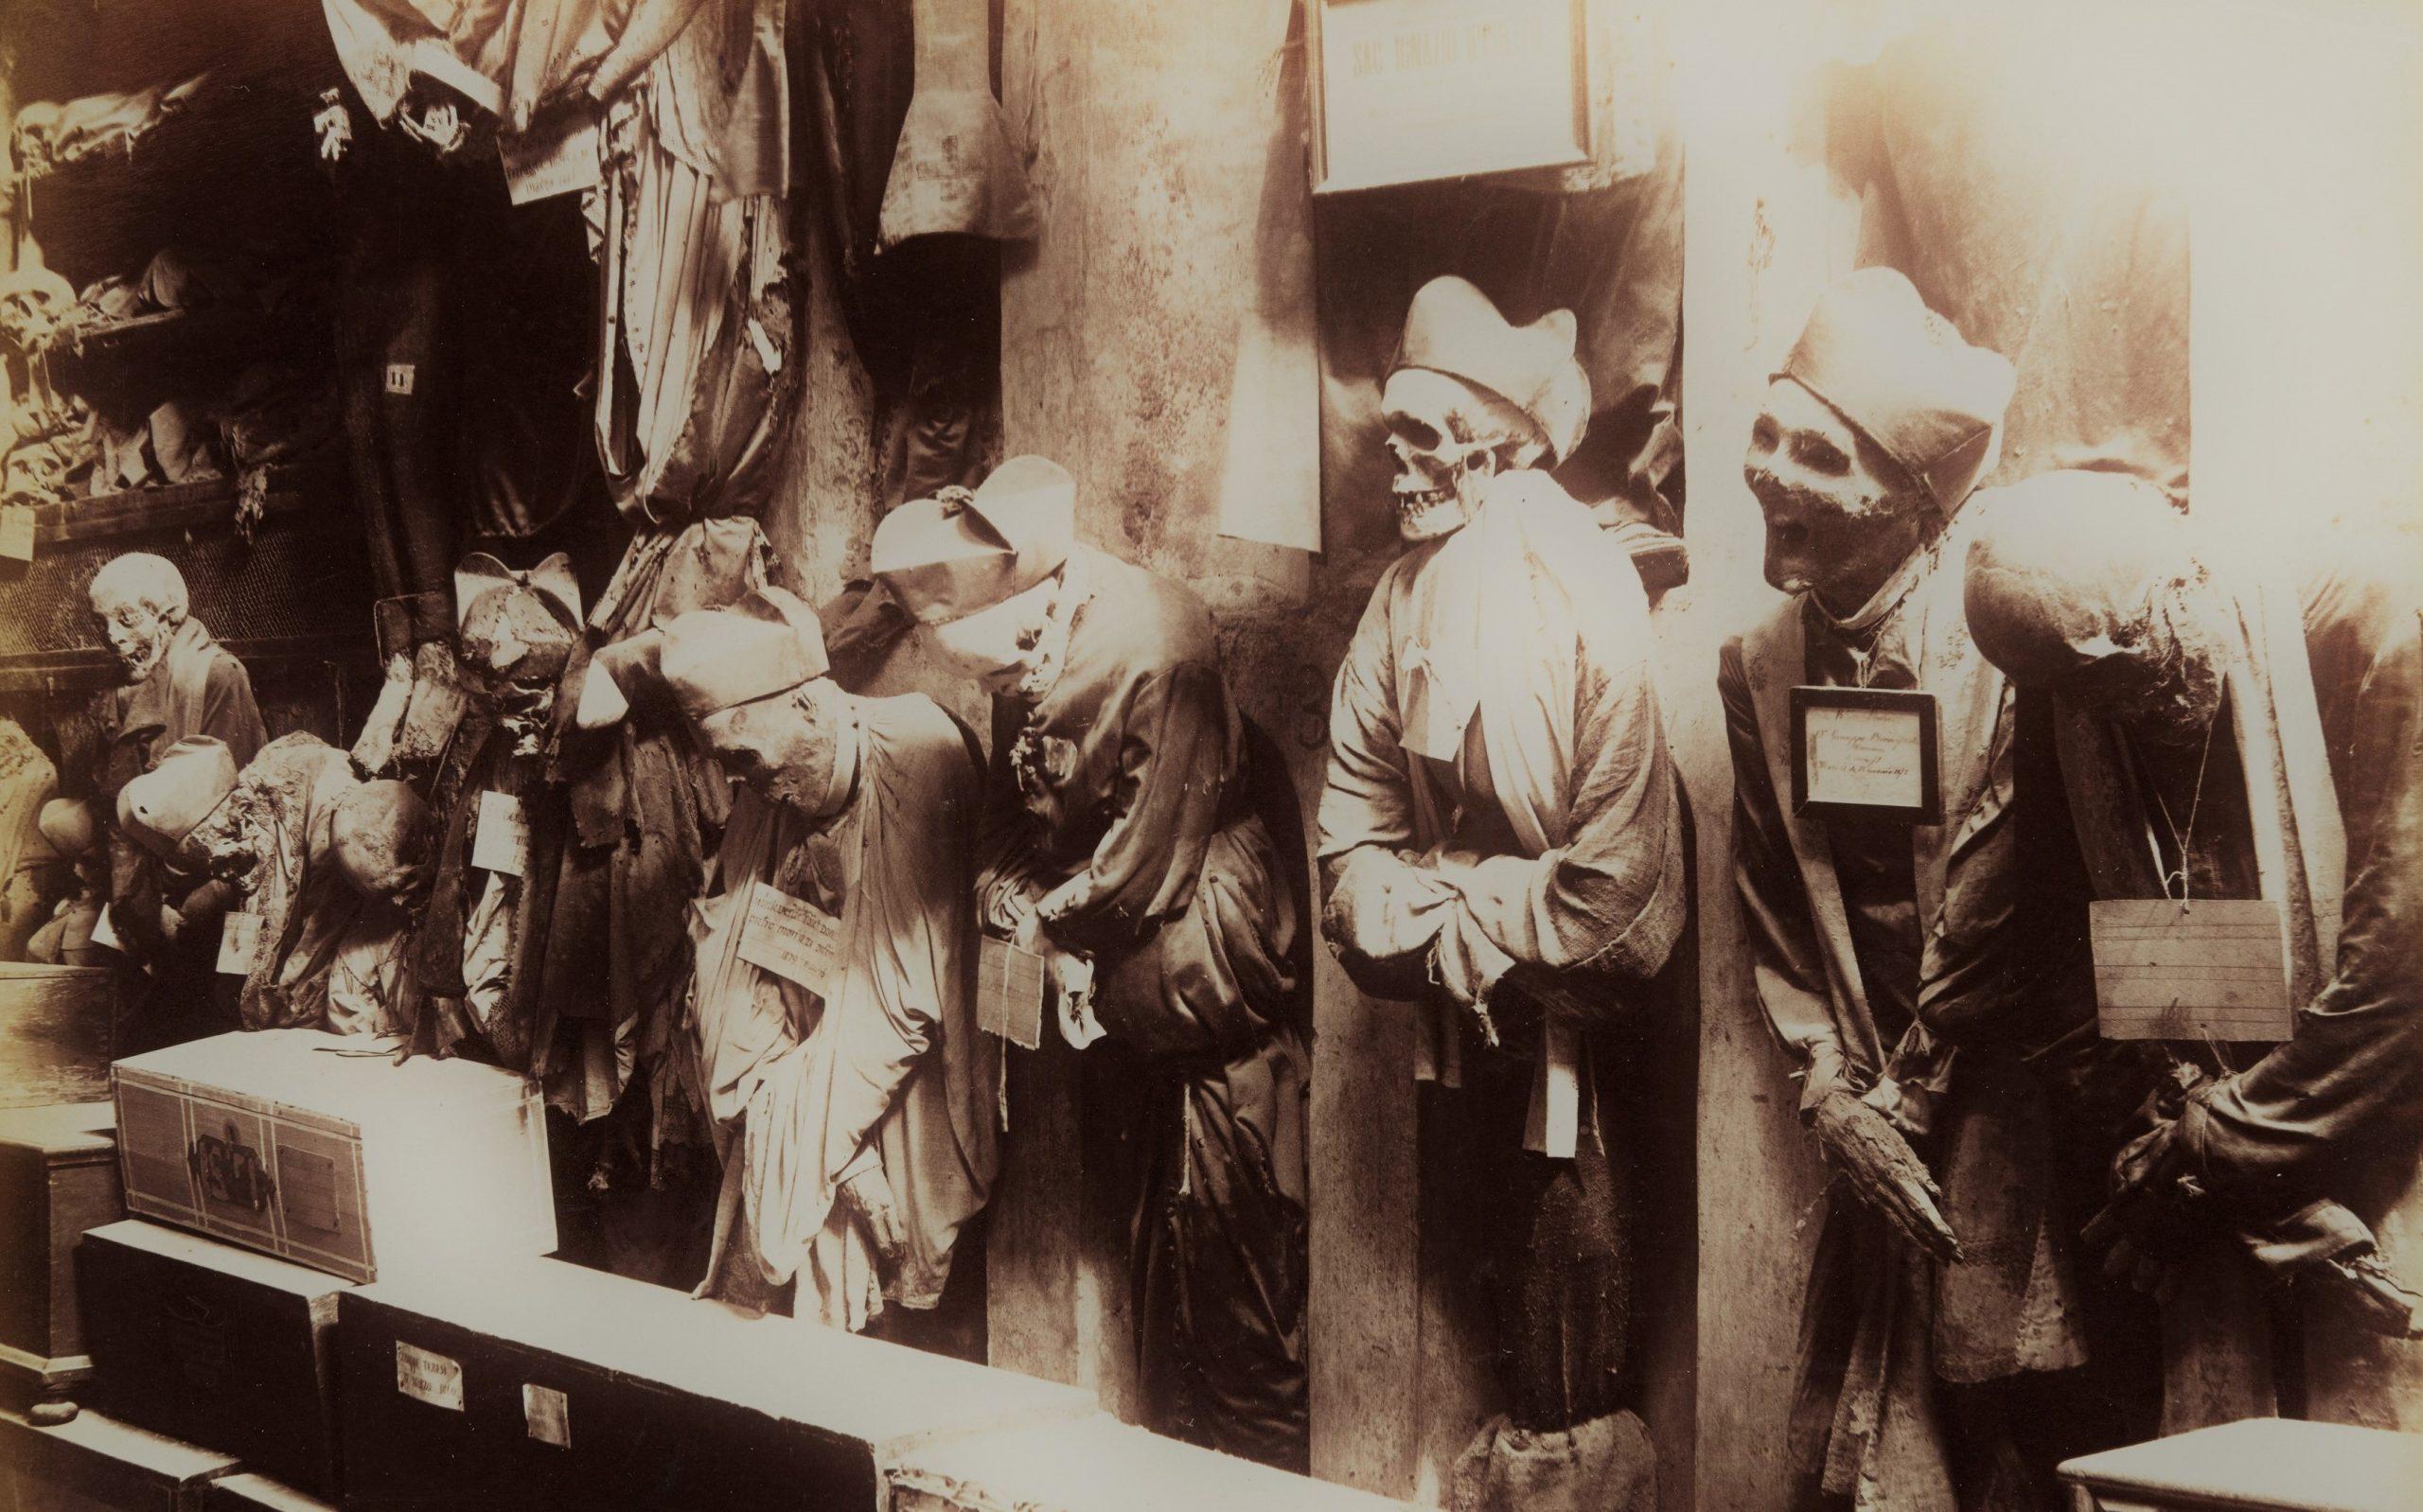 Palermo mummie cripta